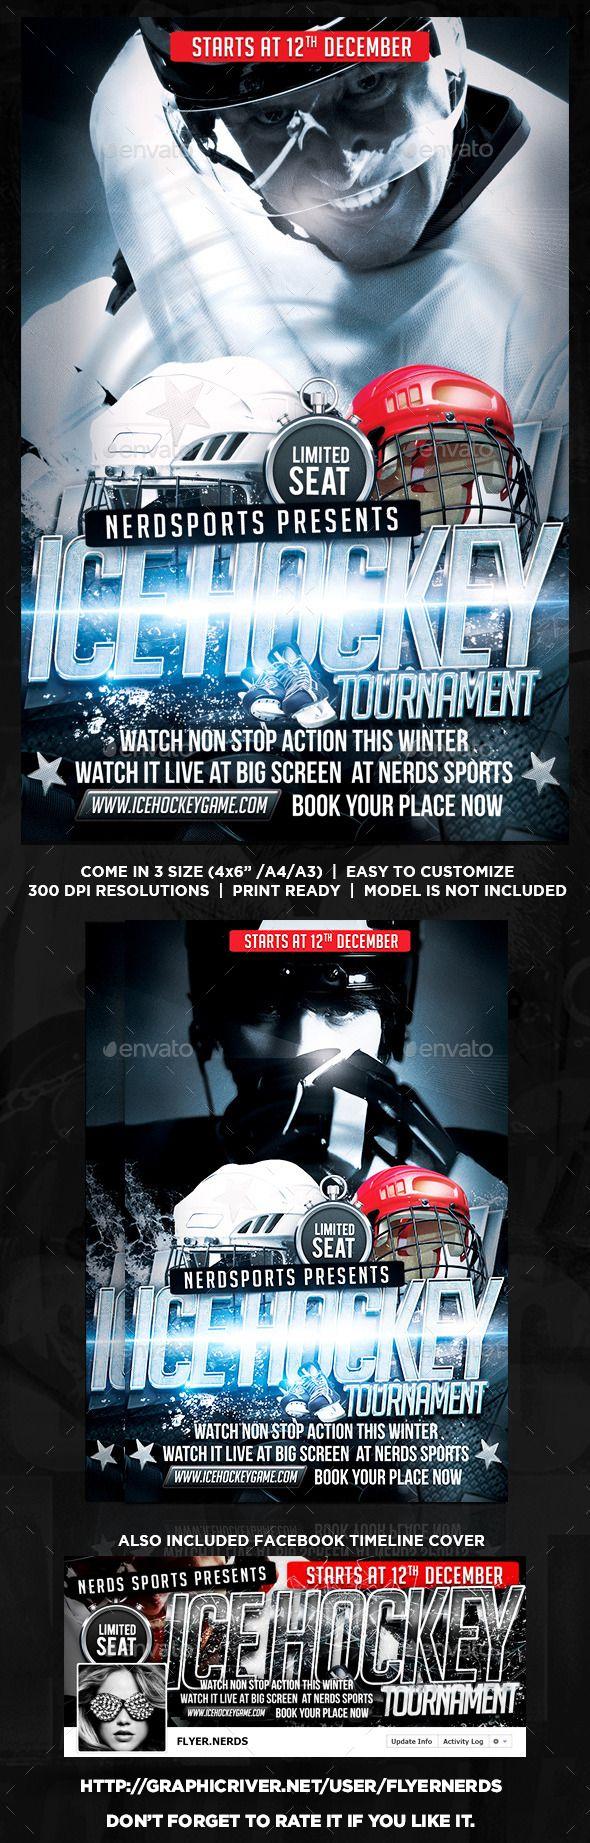 Hockey Tournament Flyer  Hockey Tournaments Hockey And Facebook